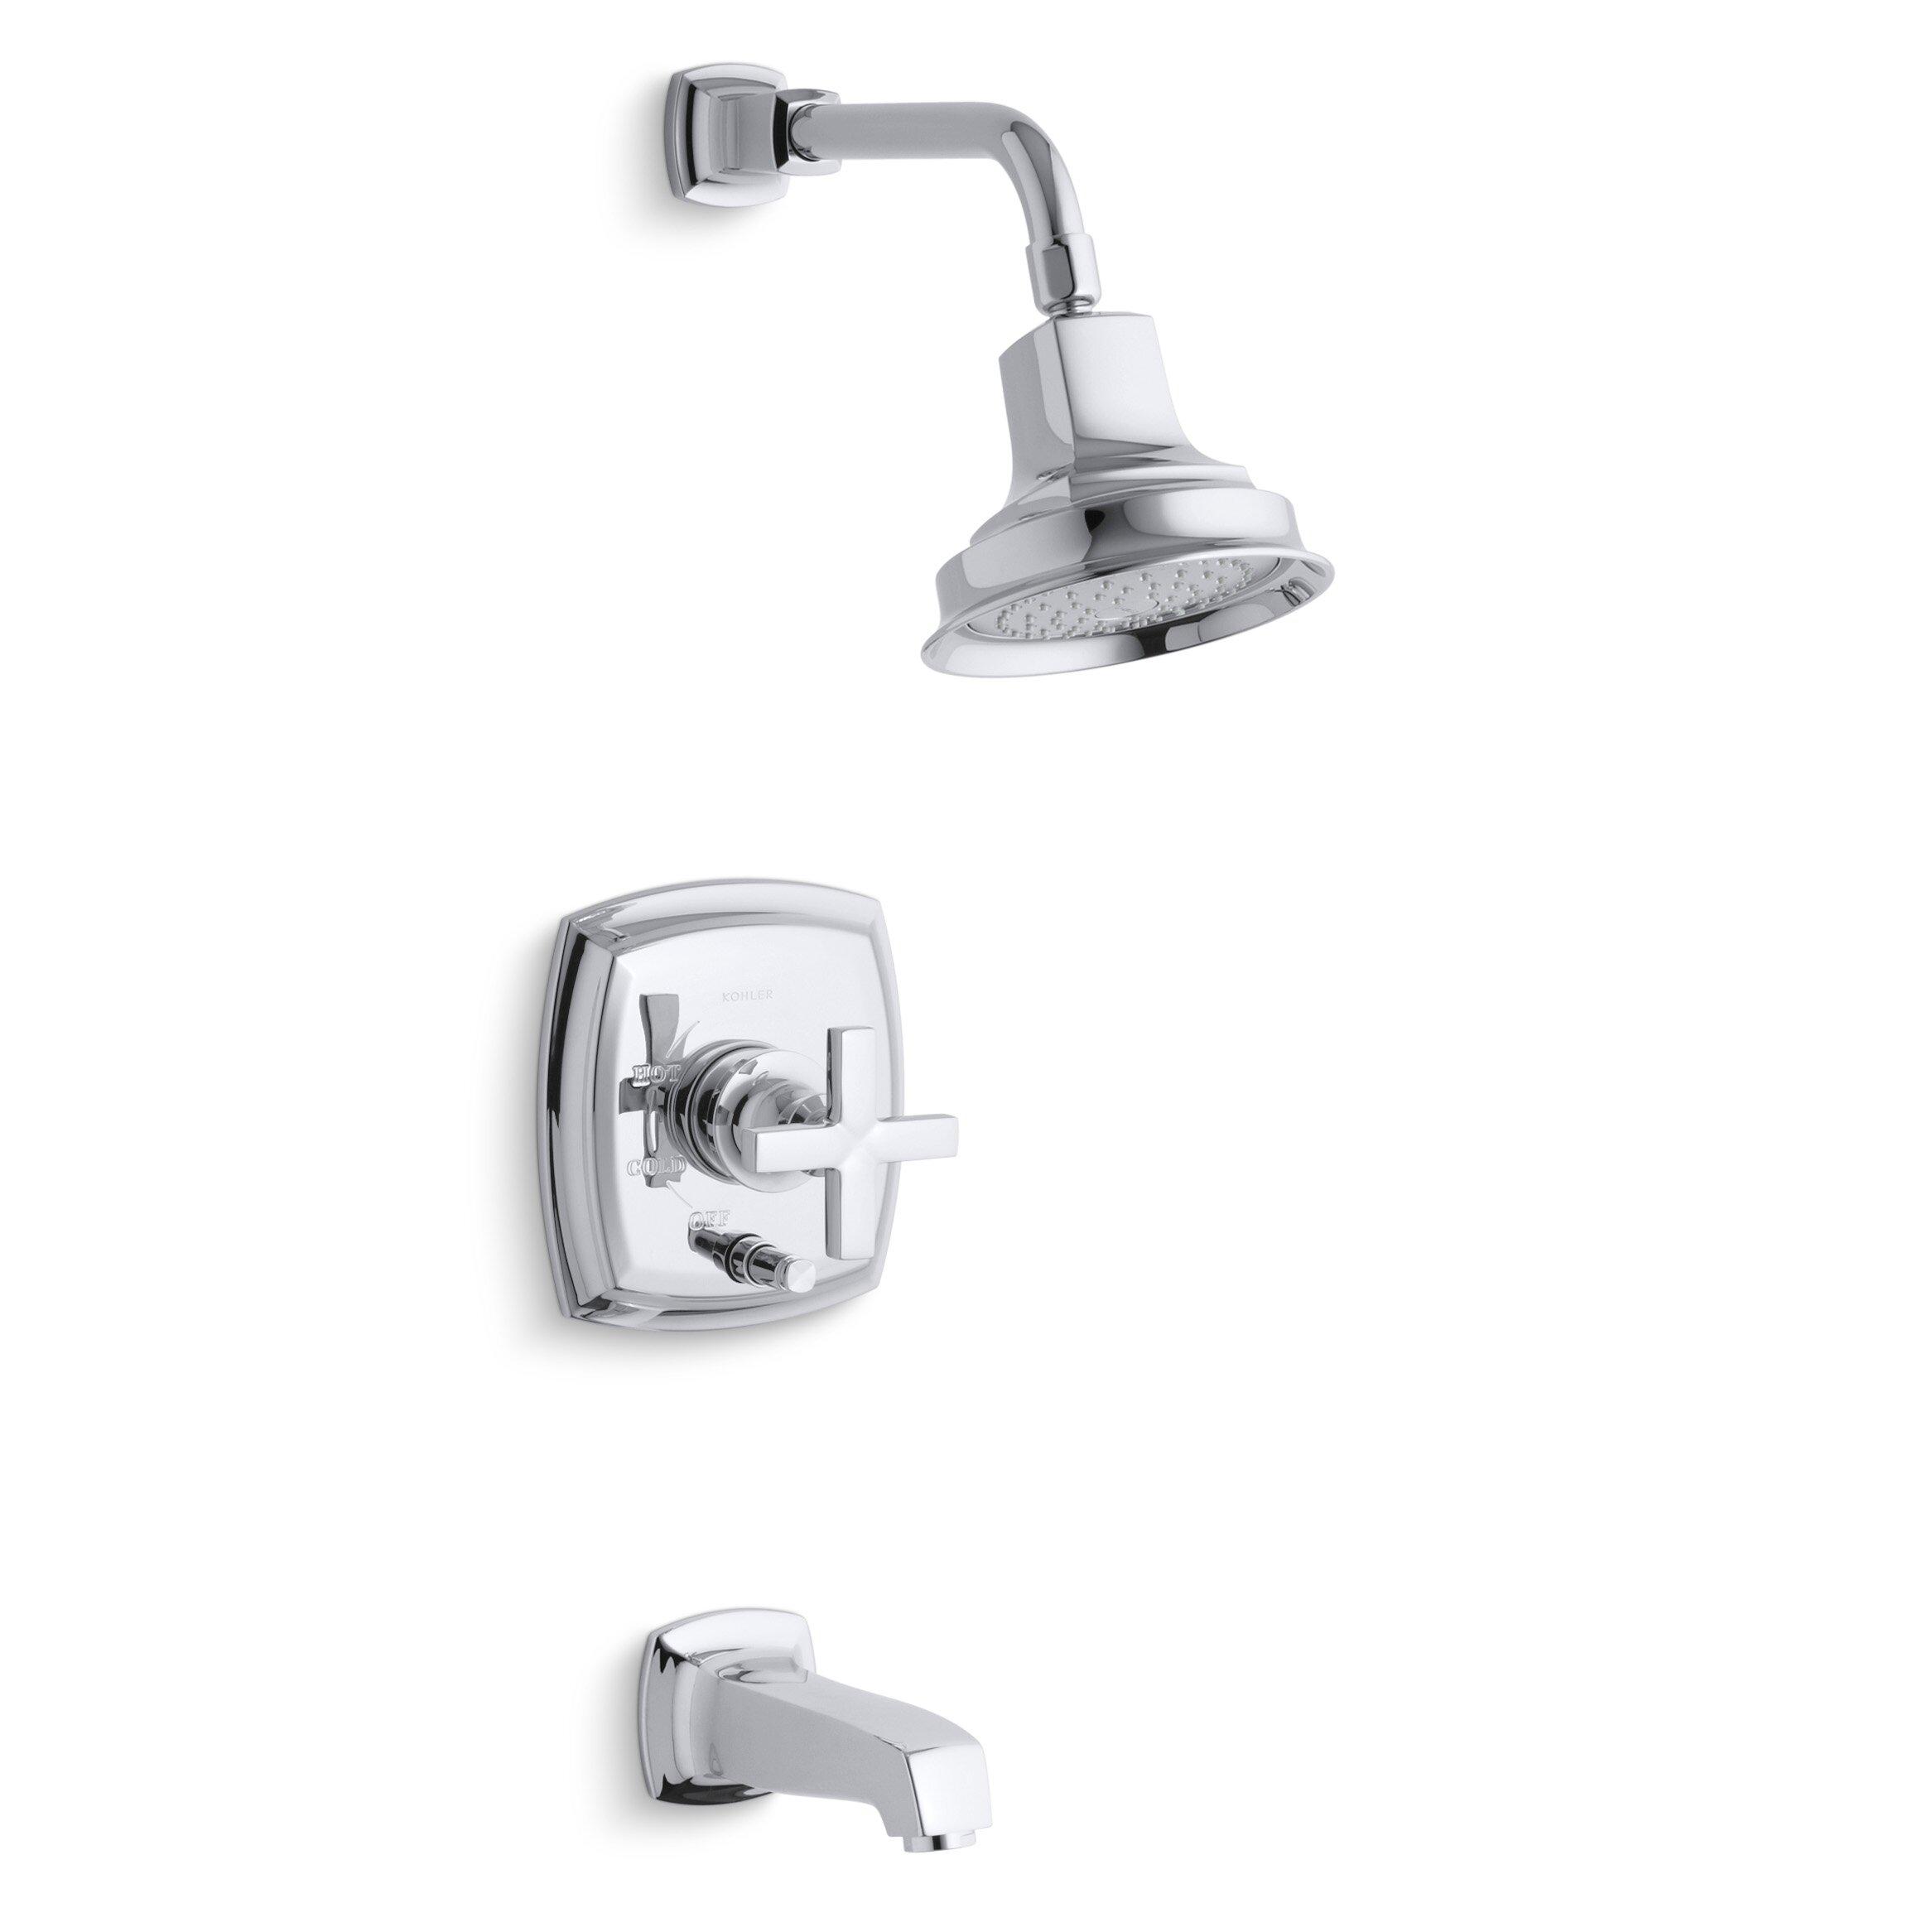 Kohler Margaux Rite Temp Pressure Balancing Bath And Shower Faucet Trim With Push Button